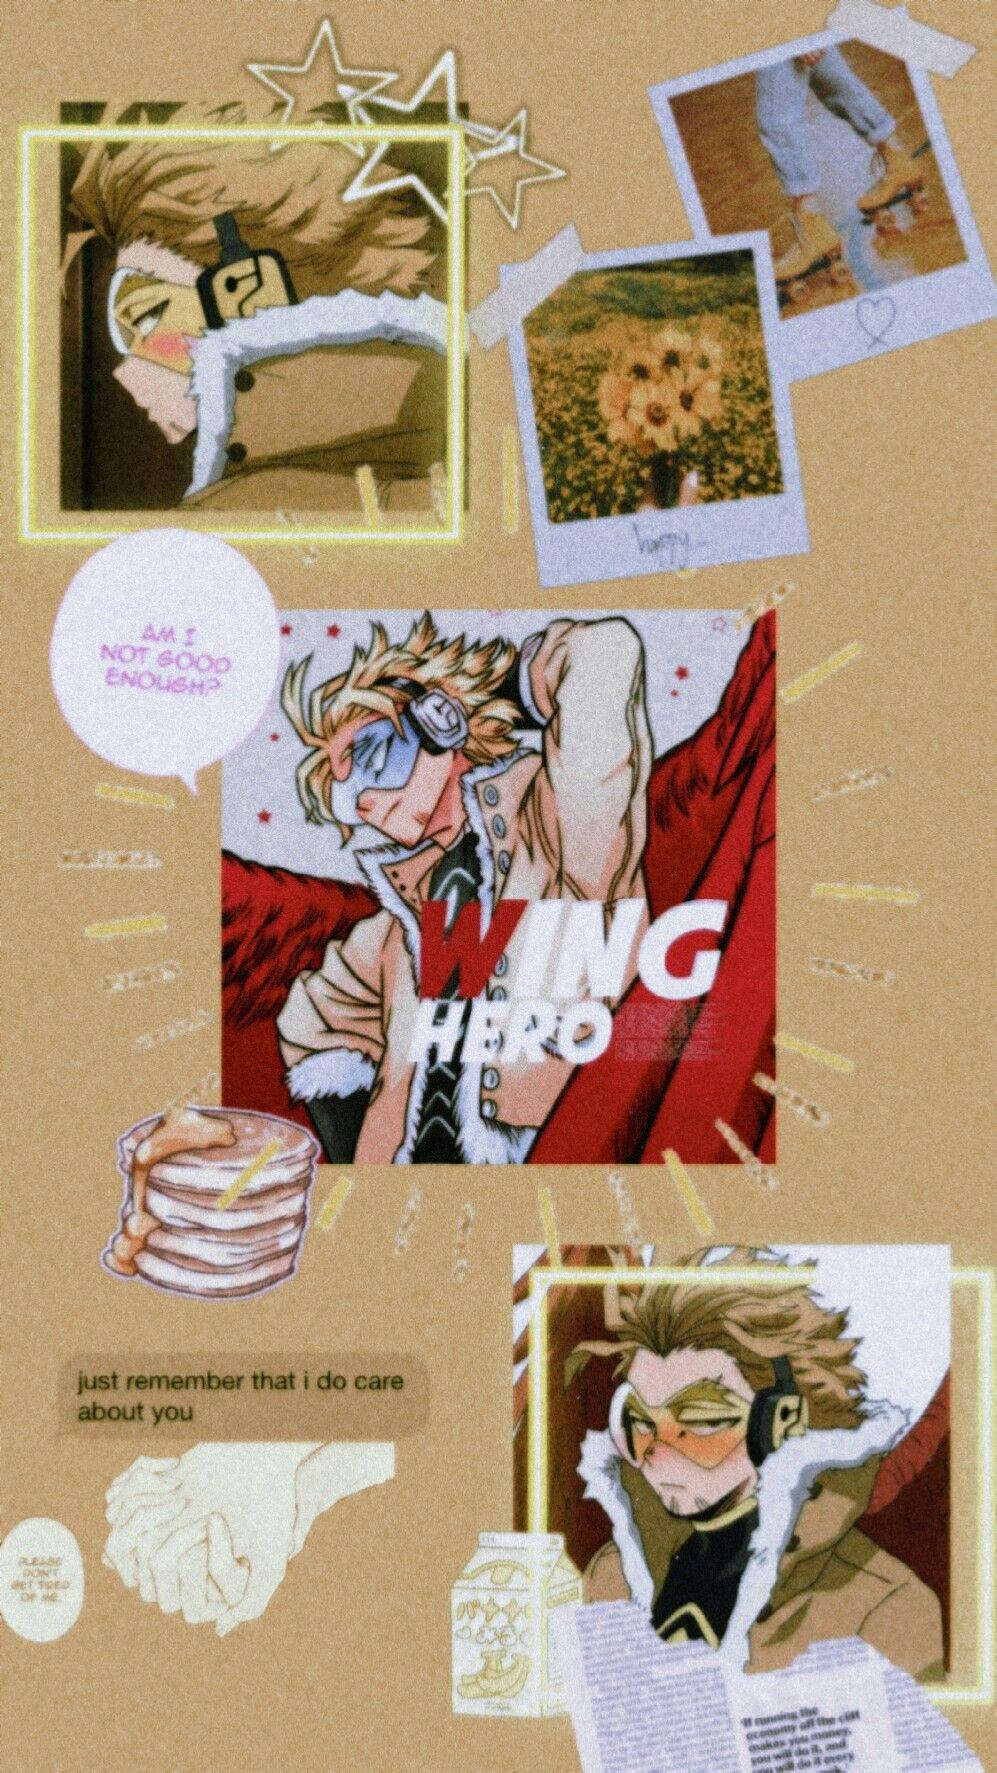 Hawks Aesthetic In 2020 Anime Wallpaper Iphone Hero Wallpaper Cute Anime Wallpaper